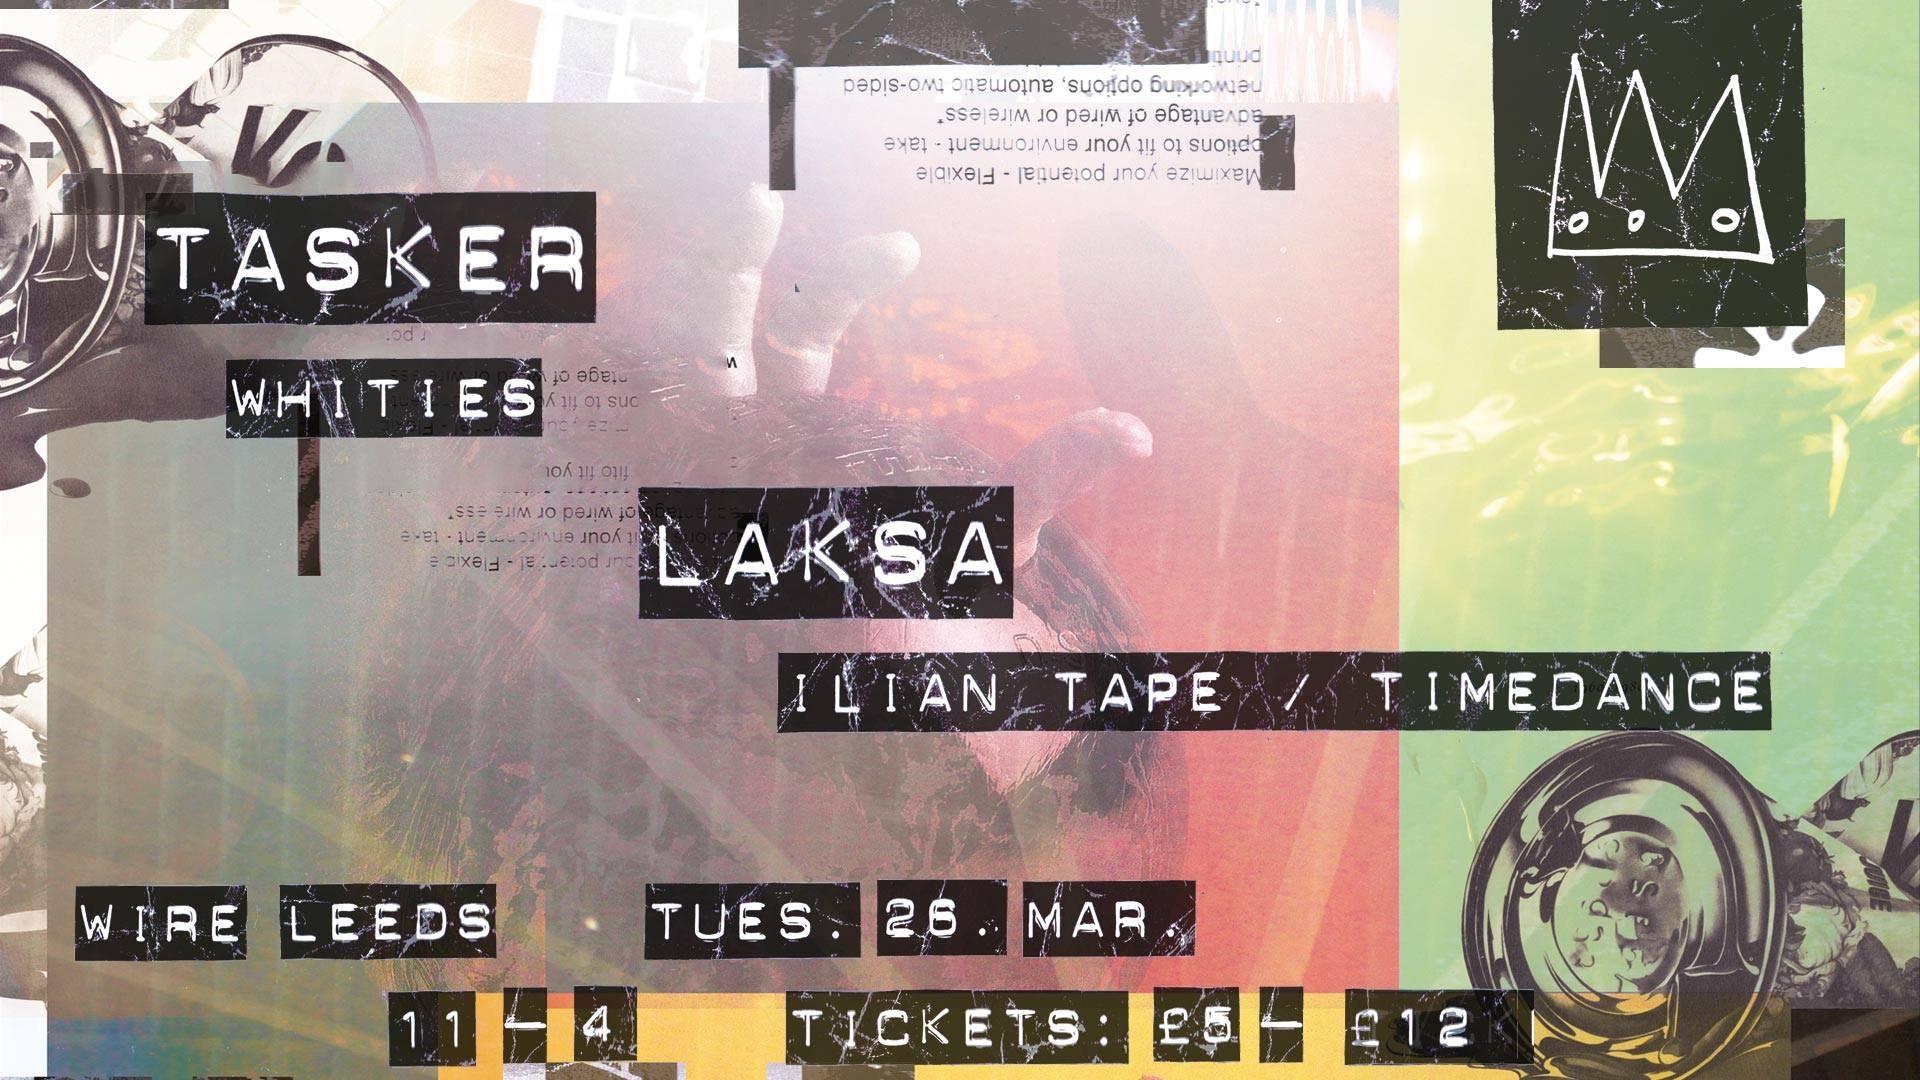 Culture – Tasker + Laksa